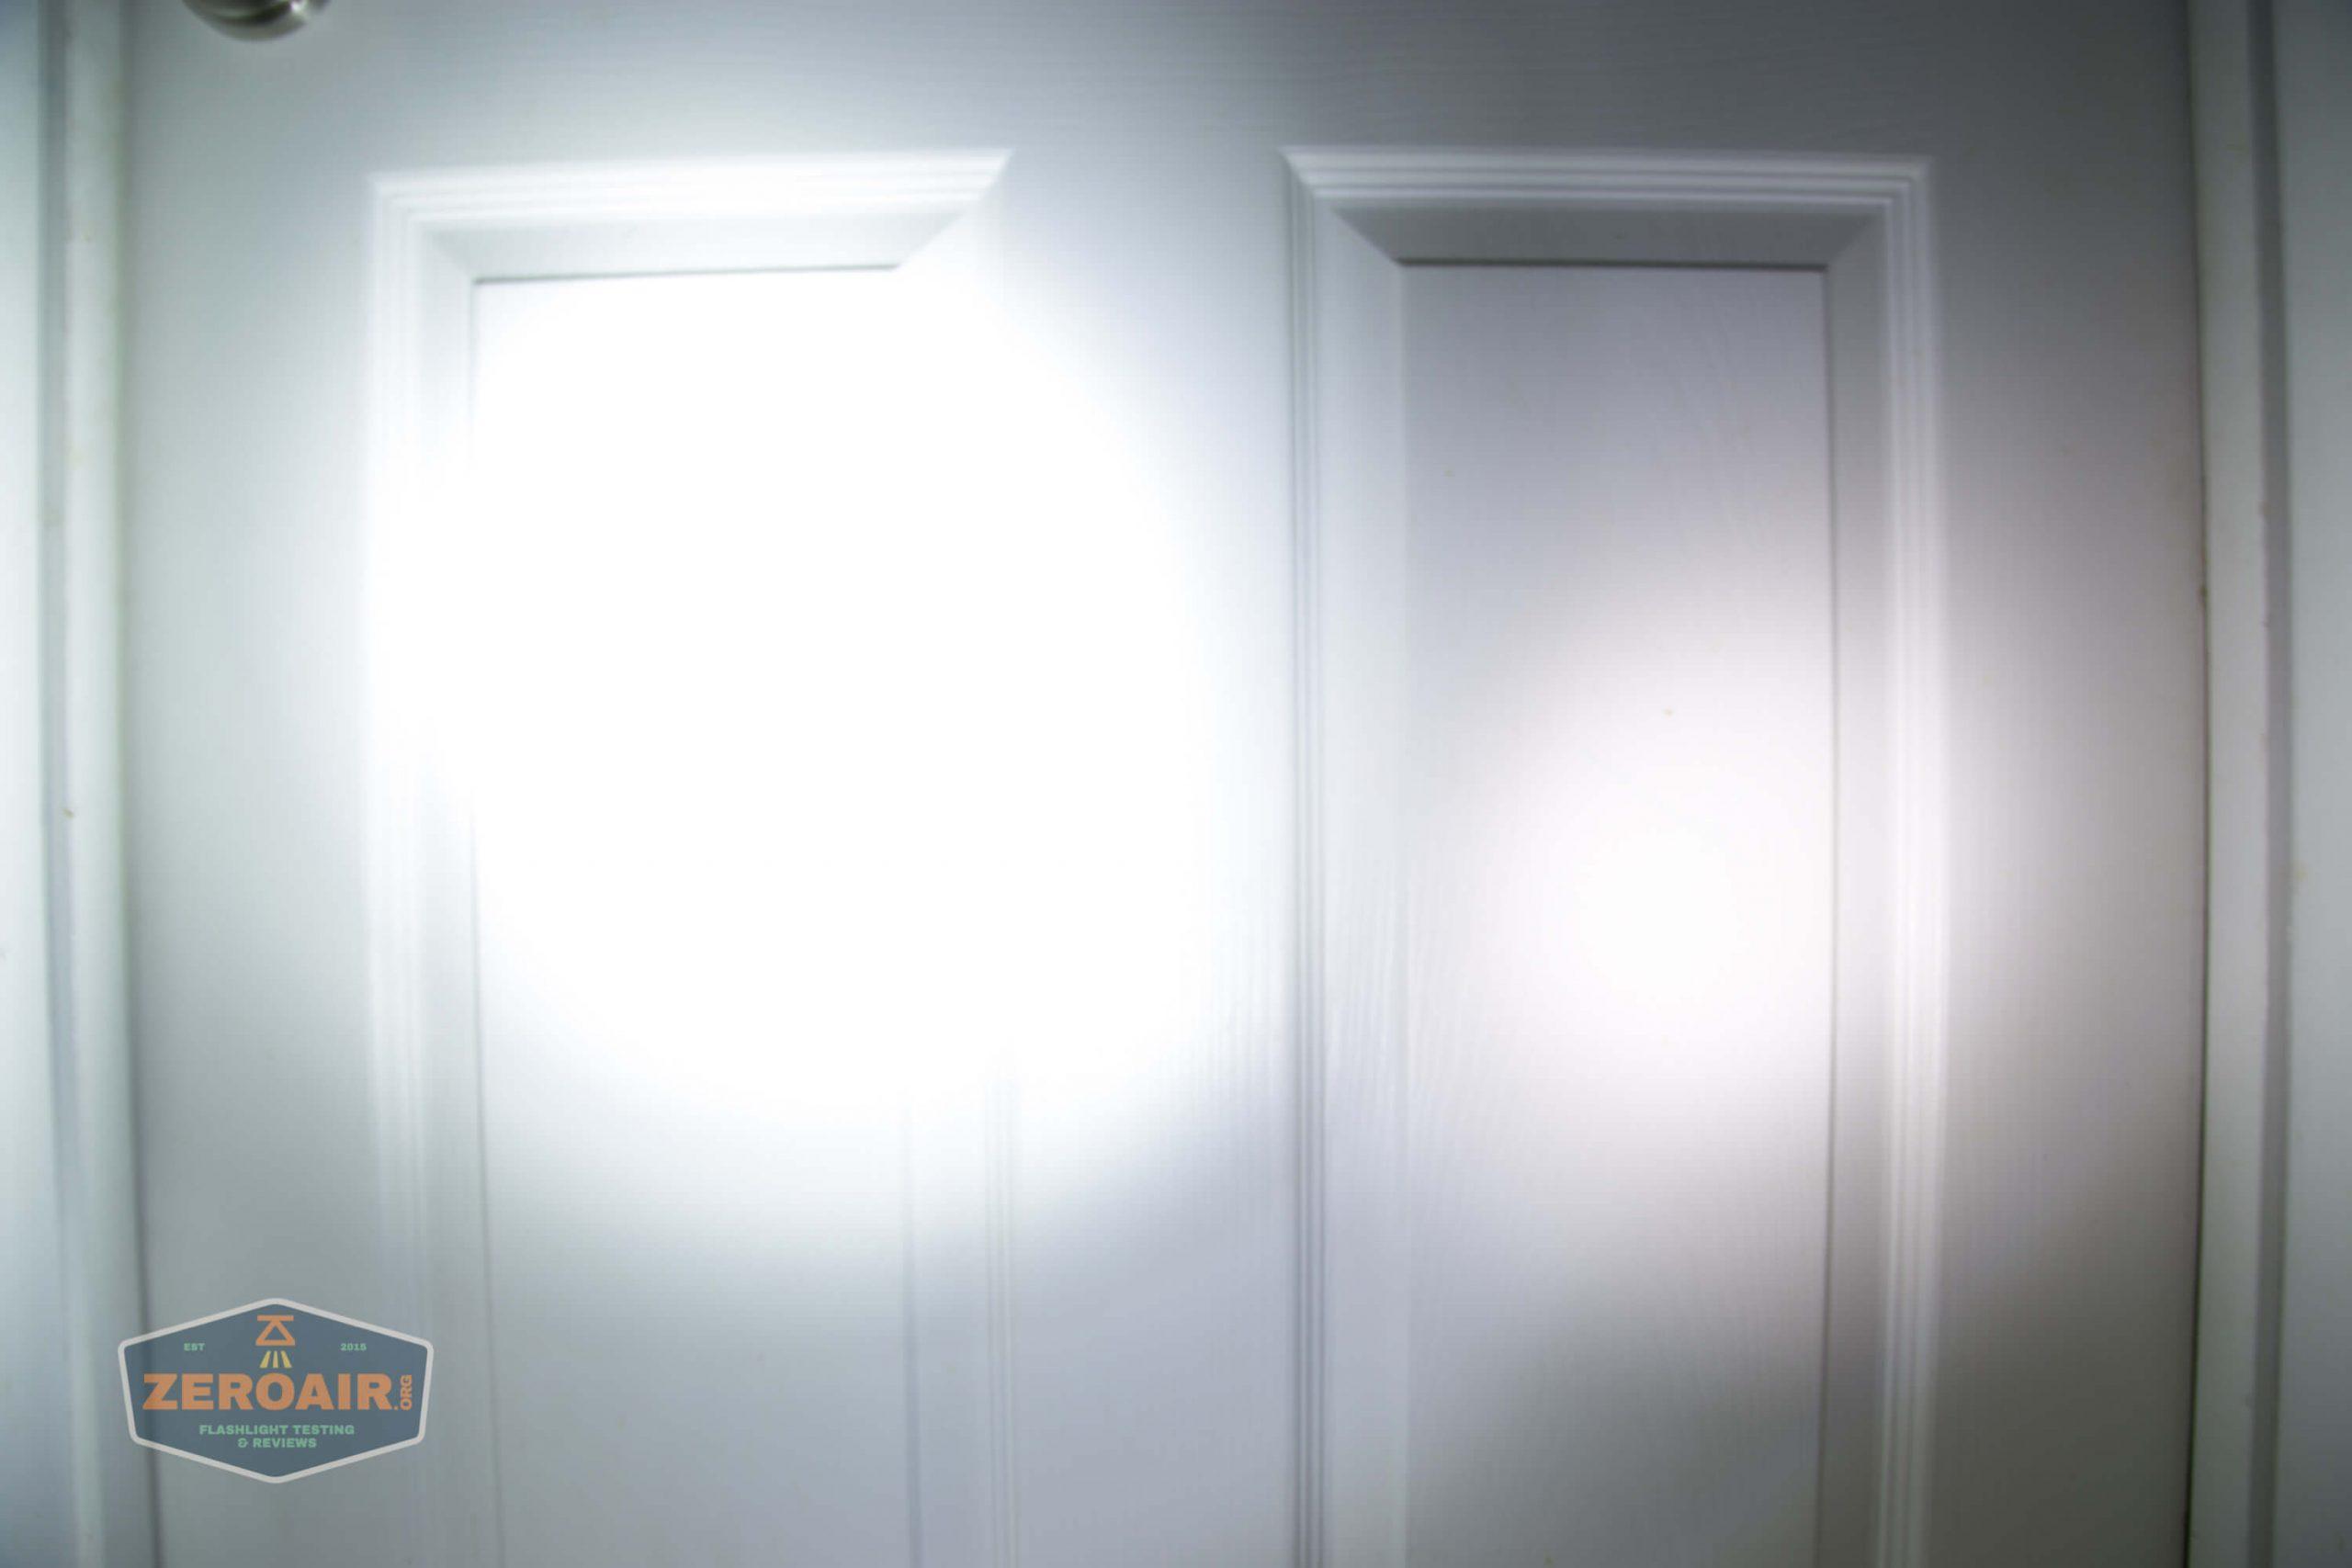 fireflylite e01 luminus sst-40 21700 beamshot door vs blf-348 7